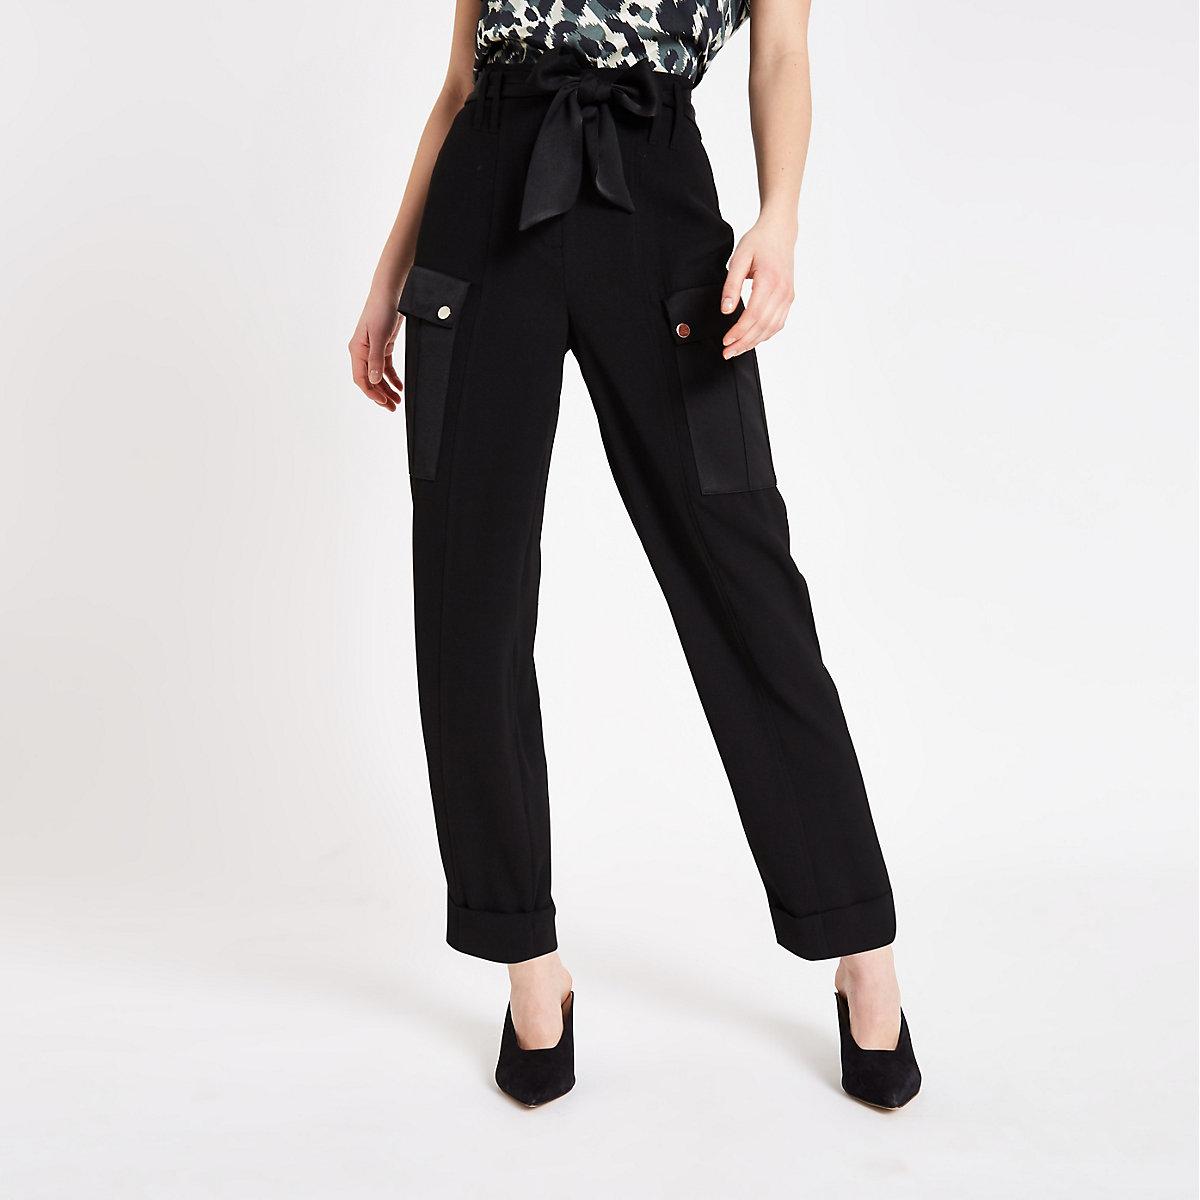 Black utility peg pants